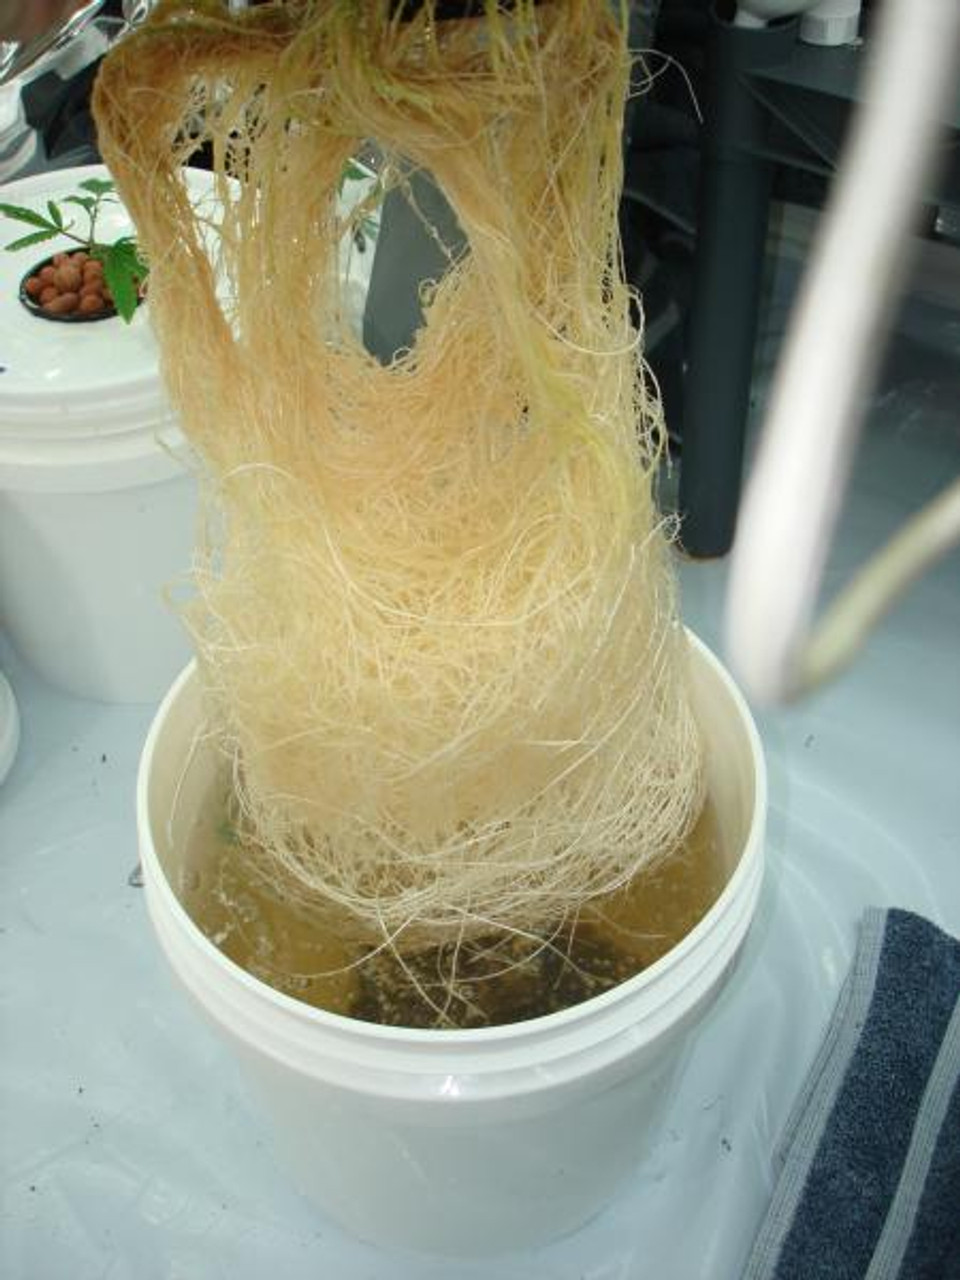 Mycostop Biofungicide WP 5 Gram Packet